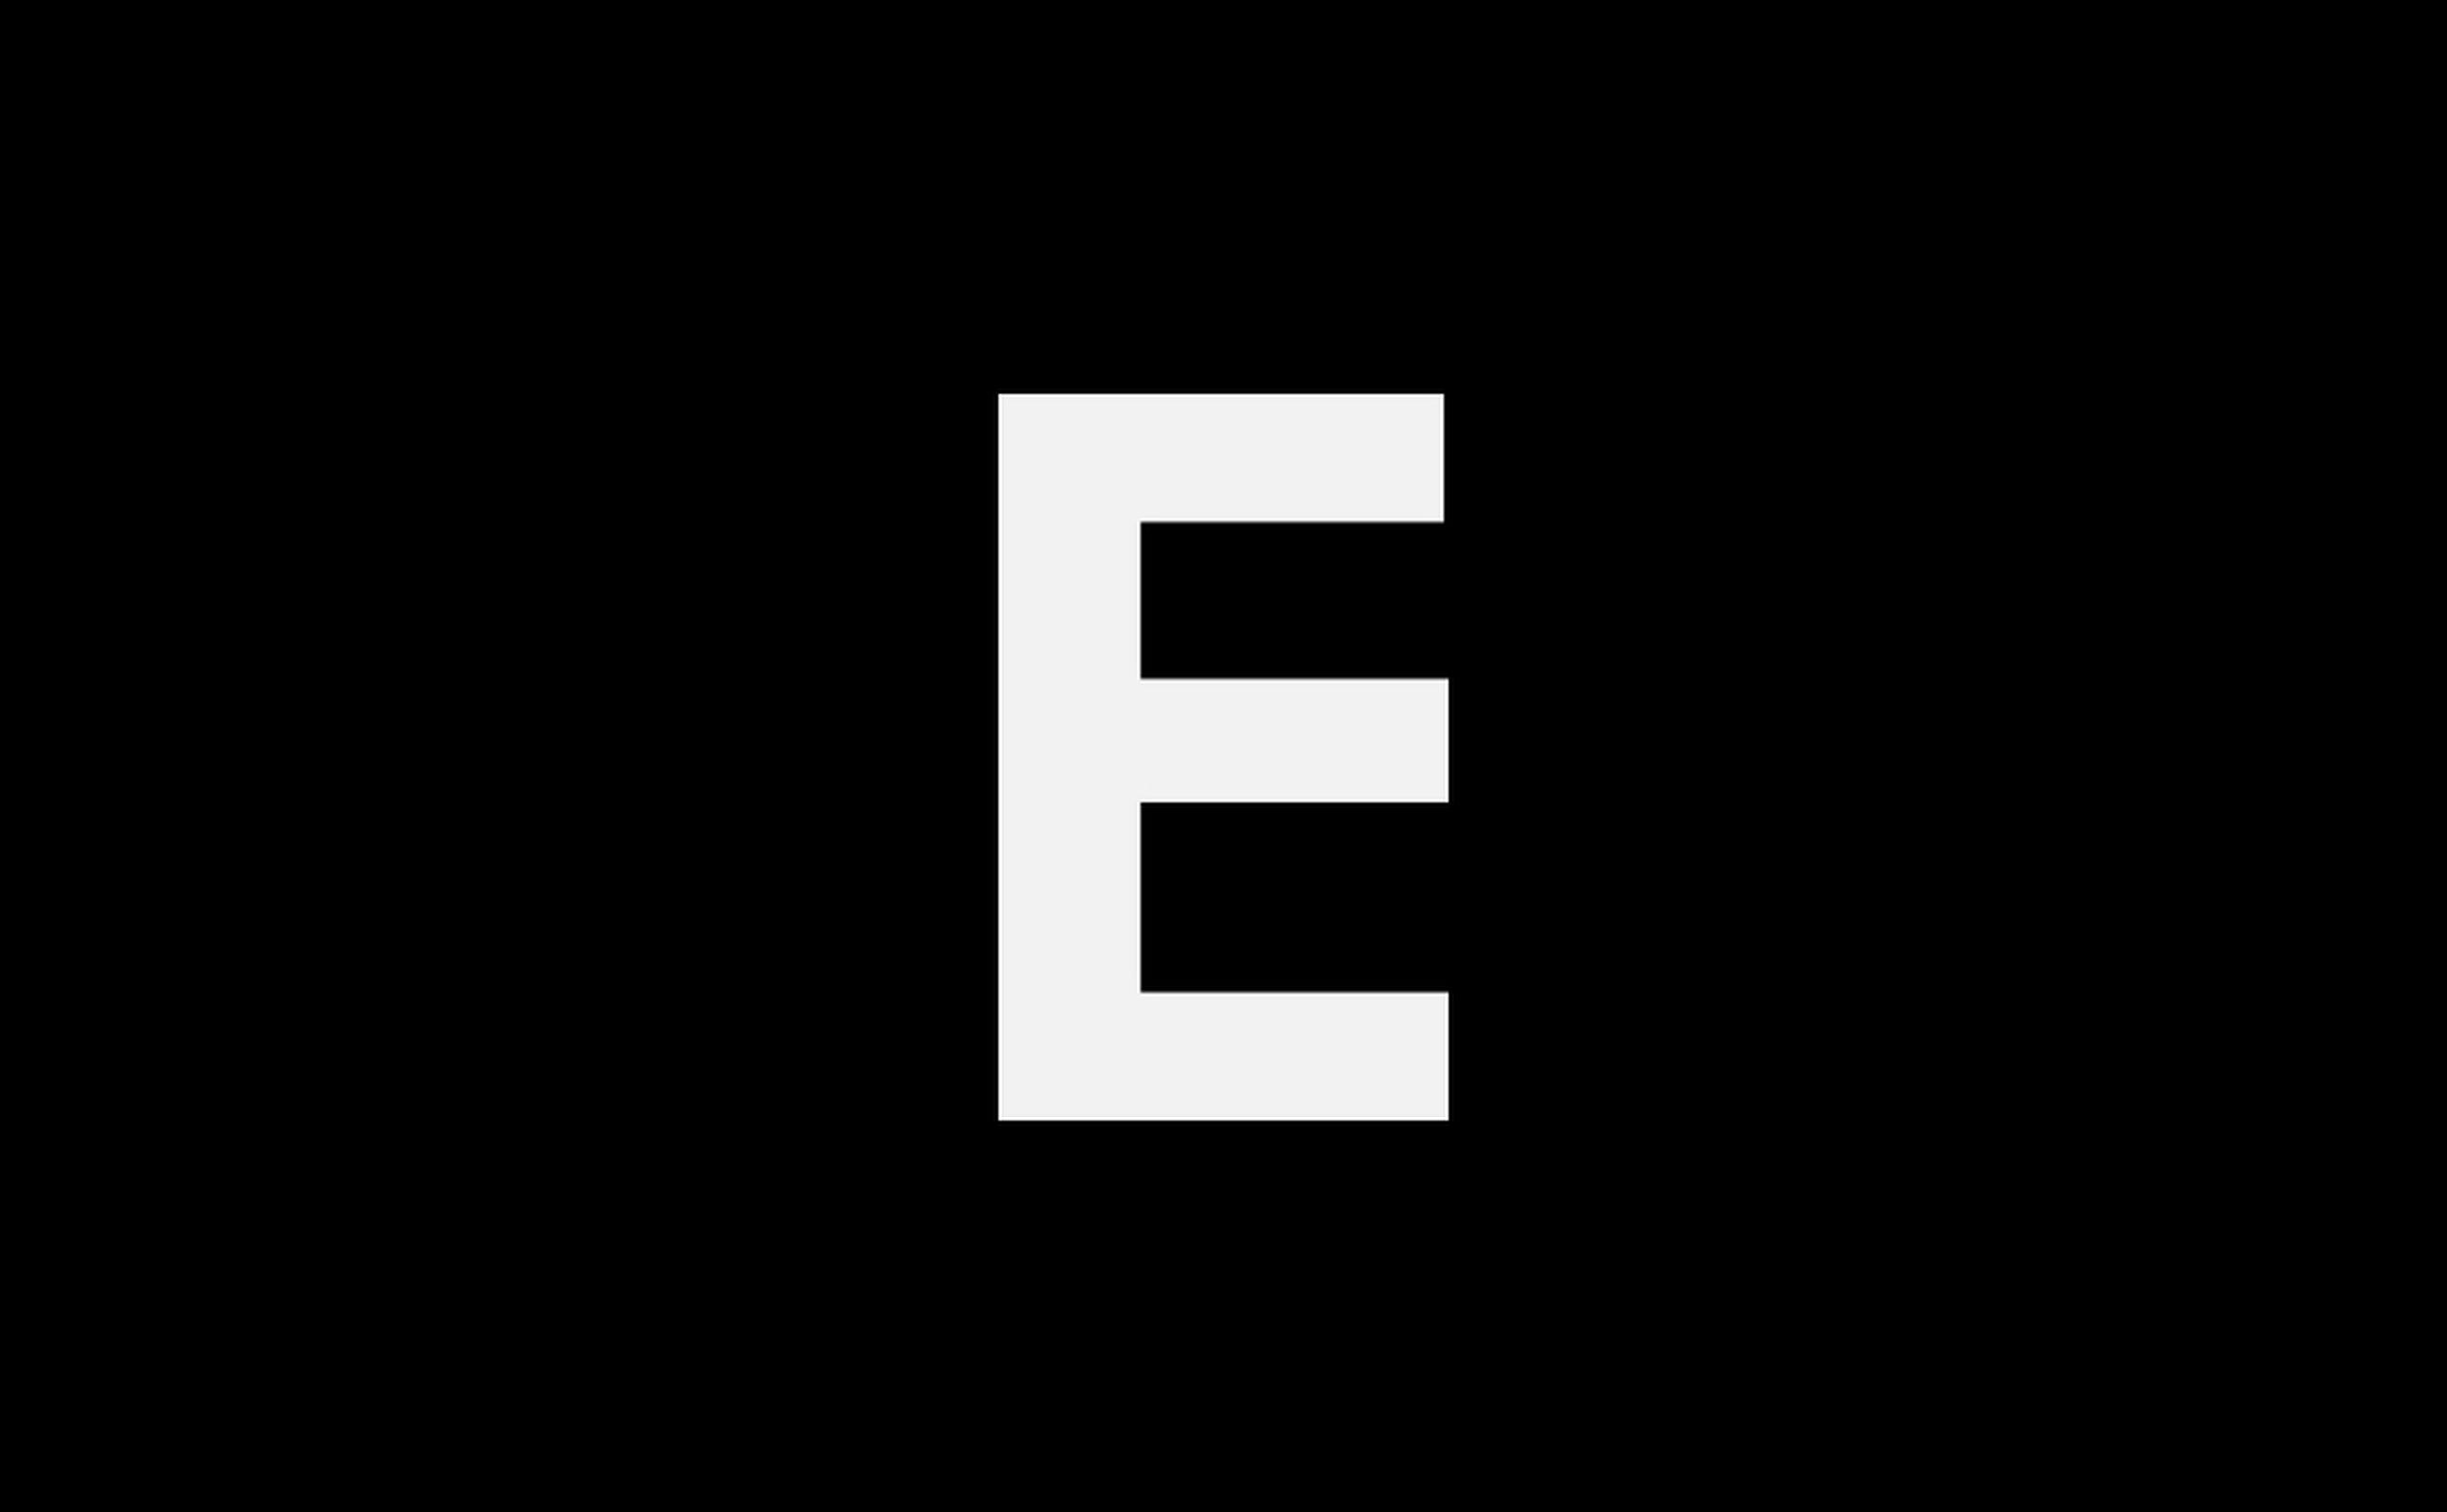 Woman crouching on rock by sea